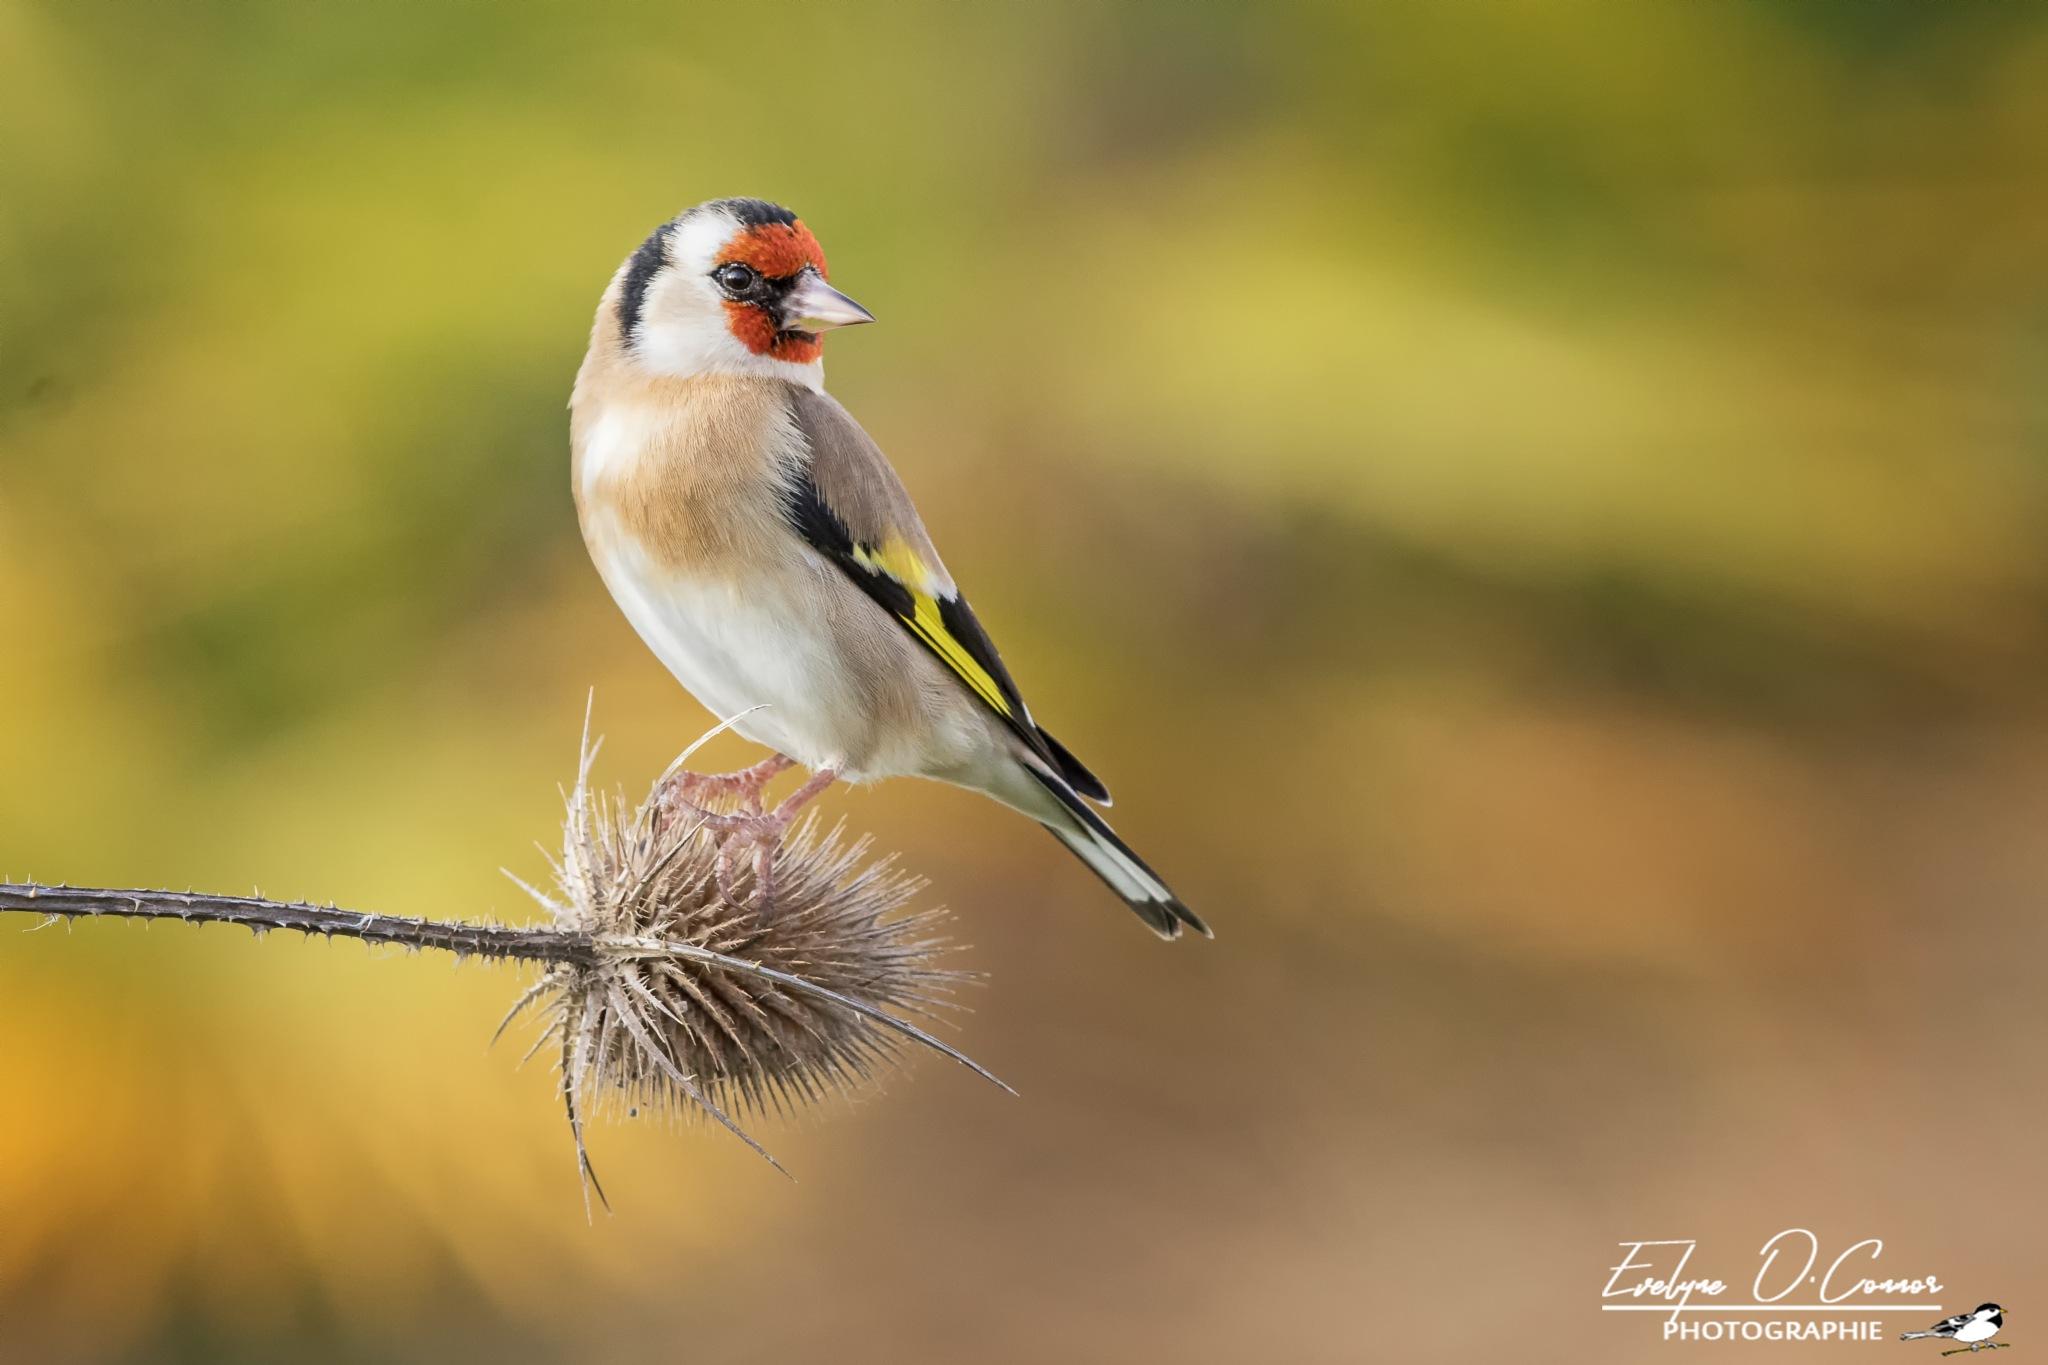 European goldfinch by Evelyne O'Connor